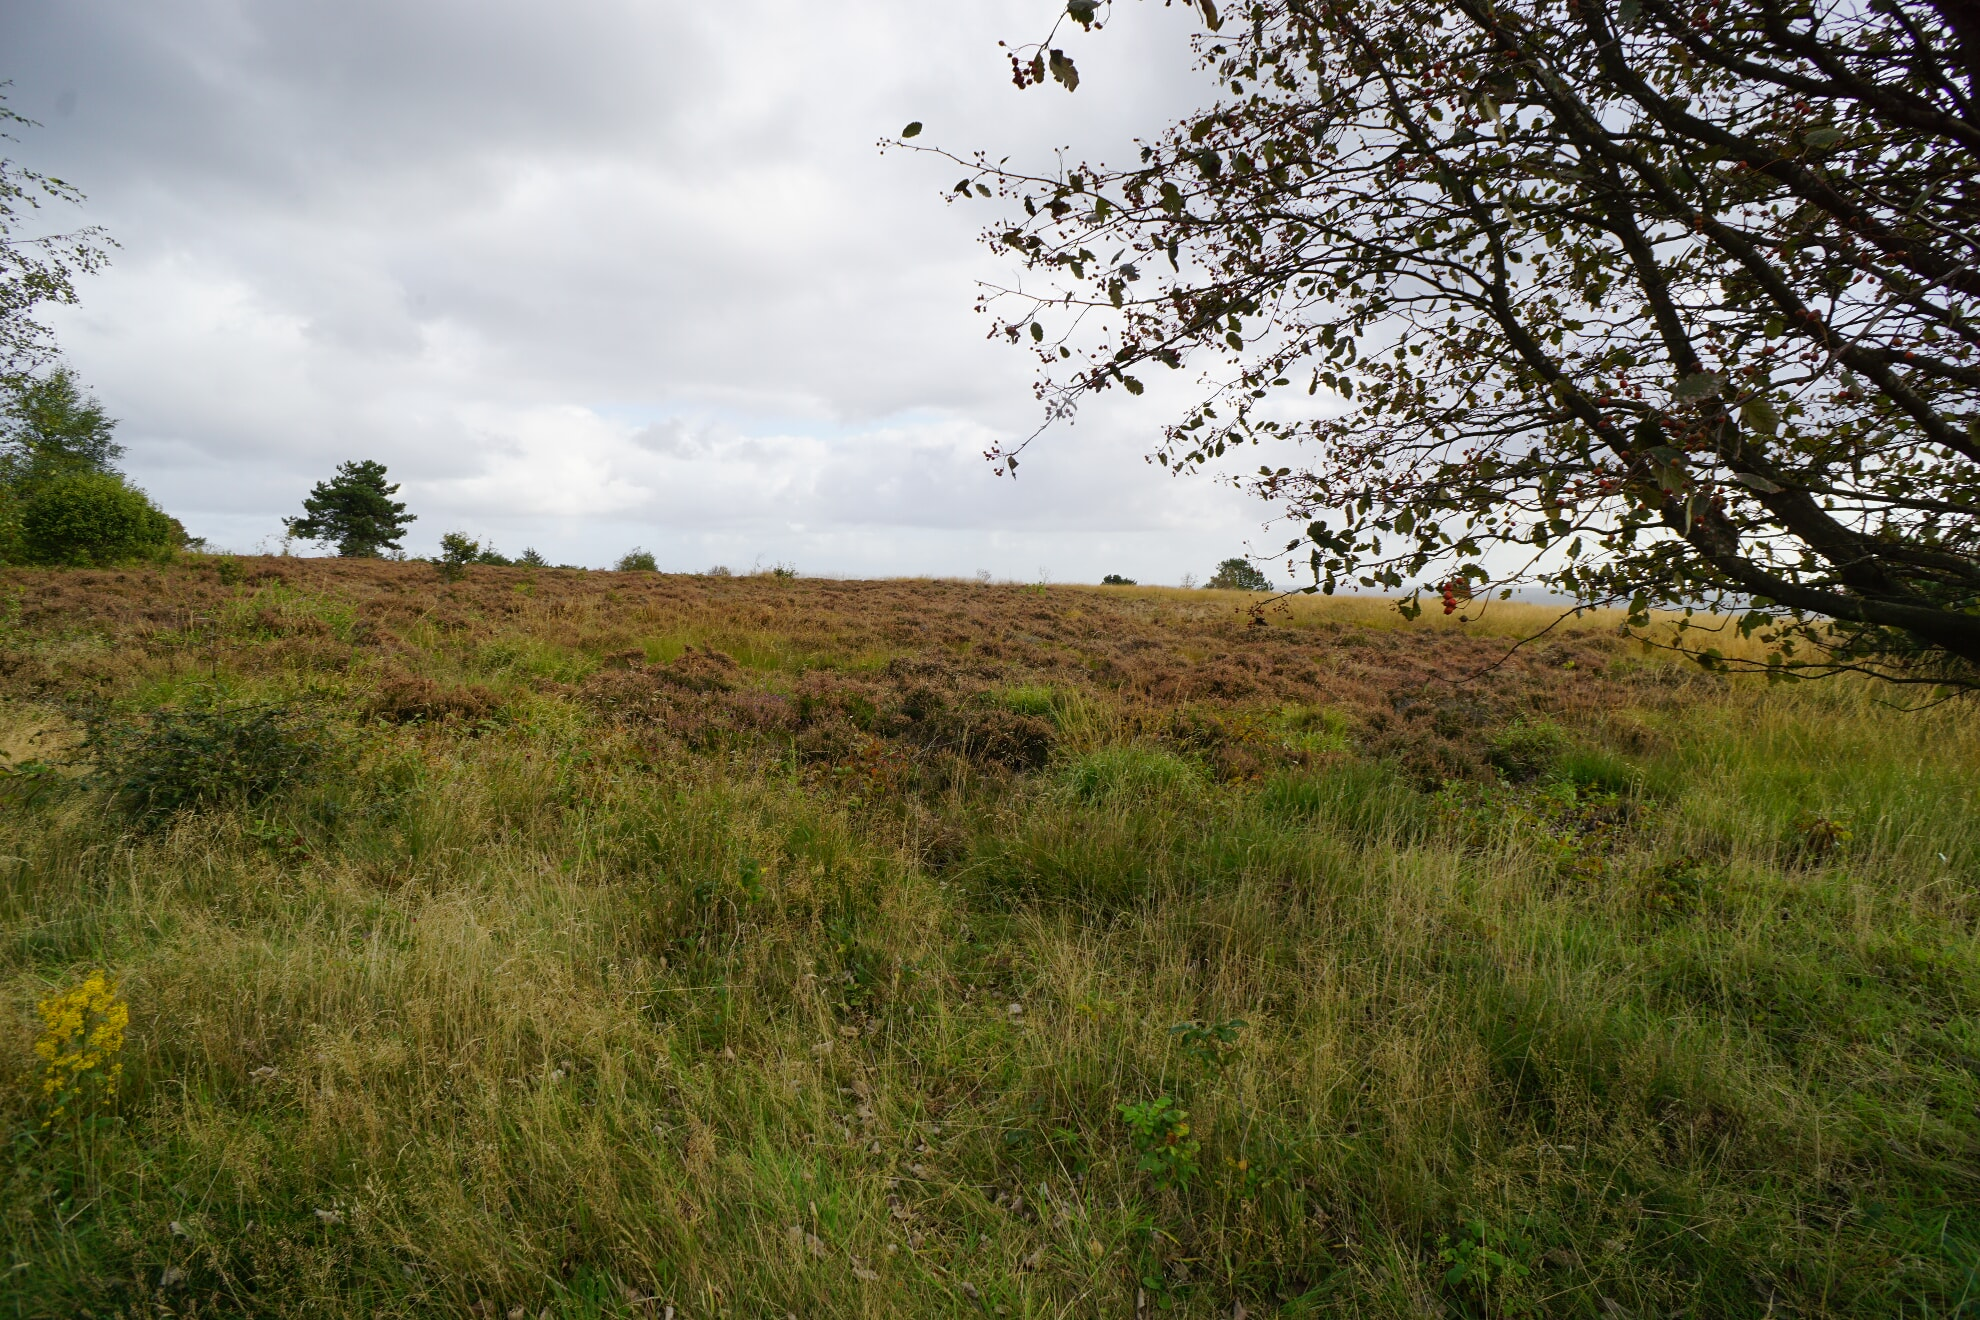 Braderuper Heide in Kampen